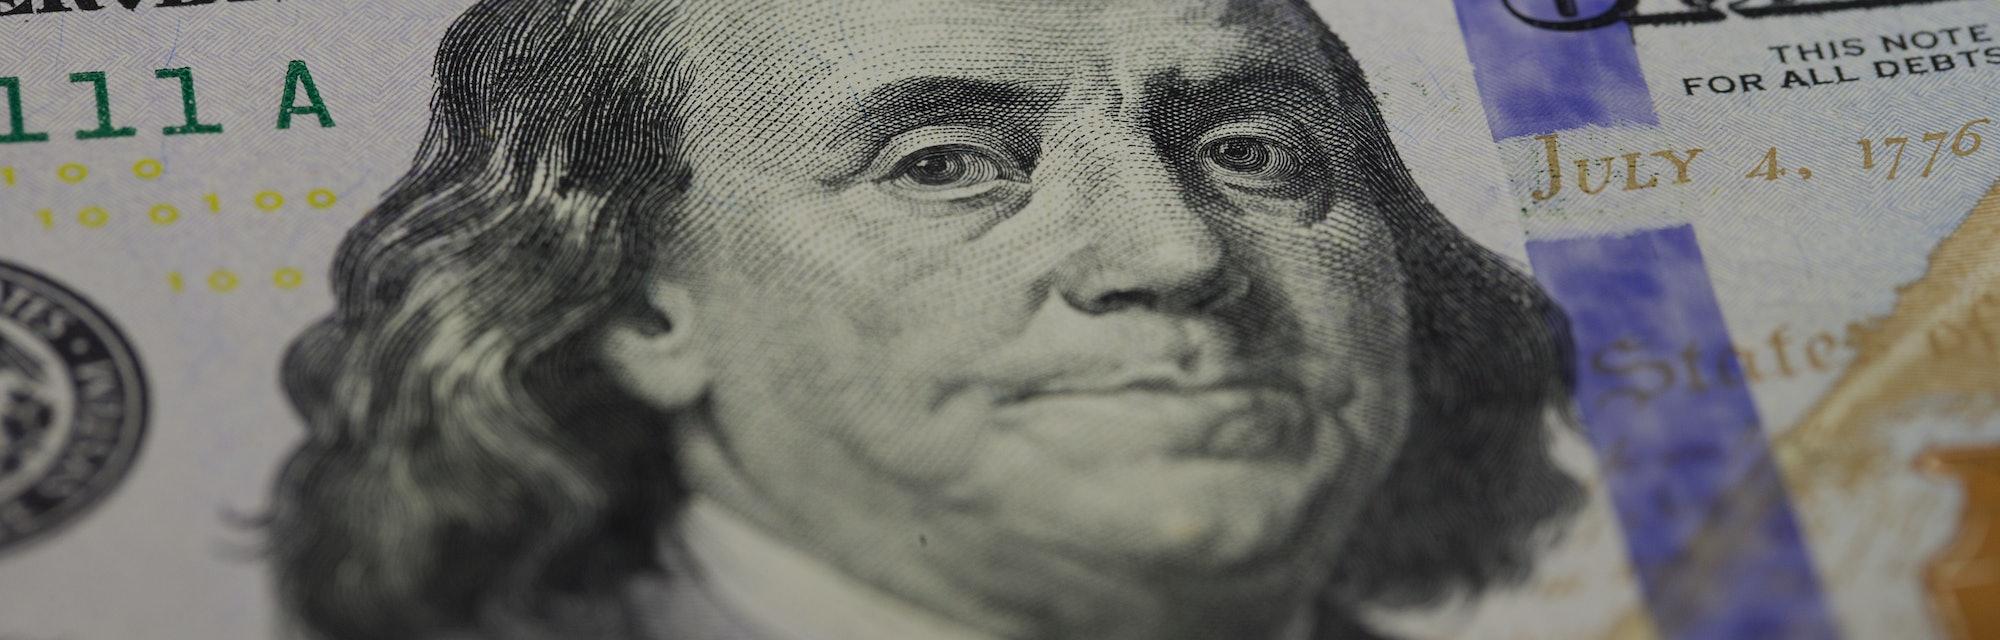 Dolar closeup.American money bills